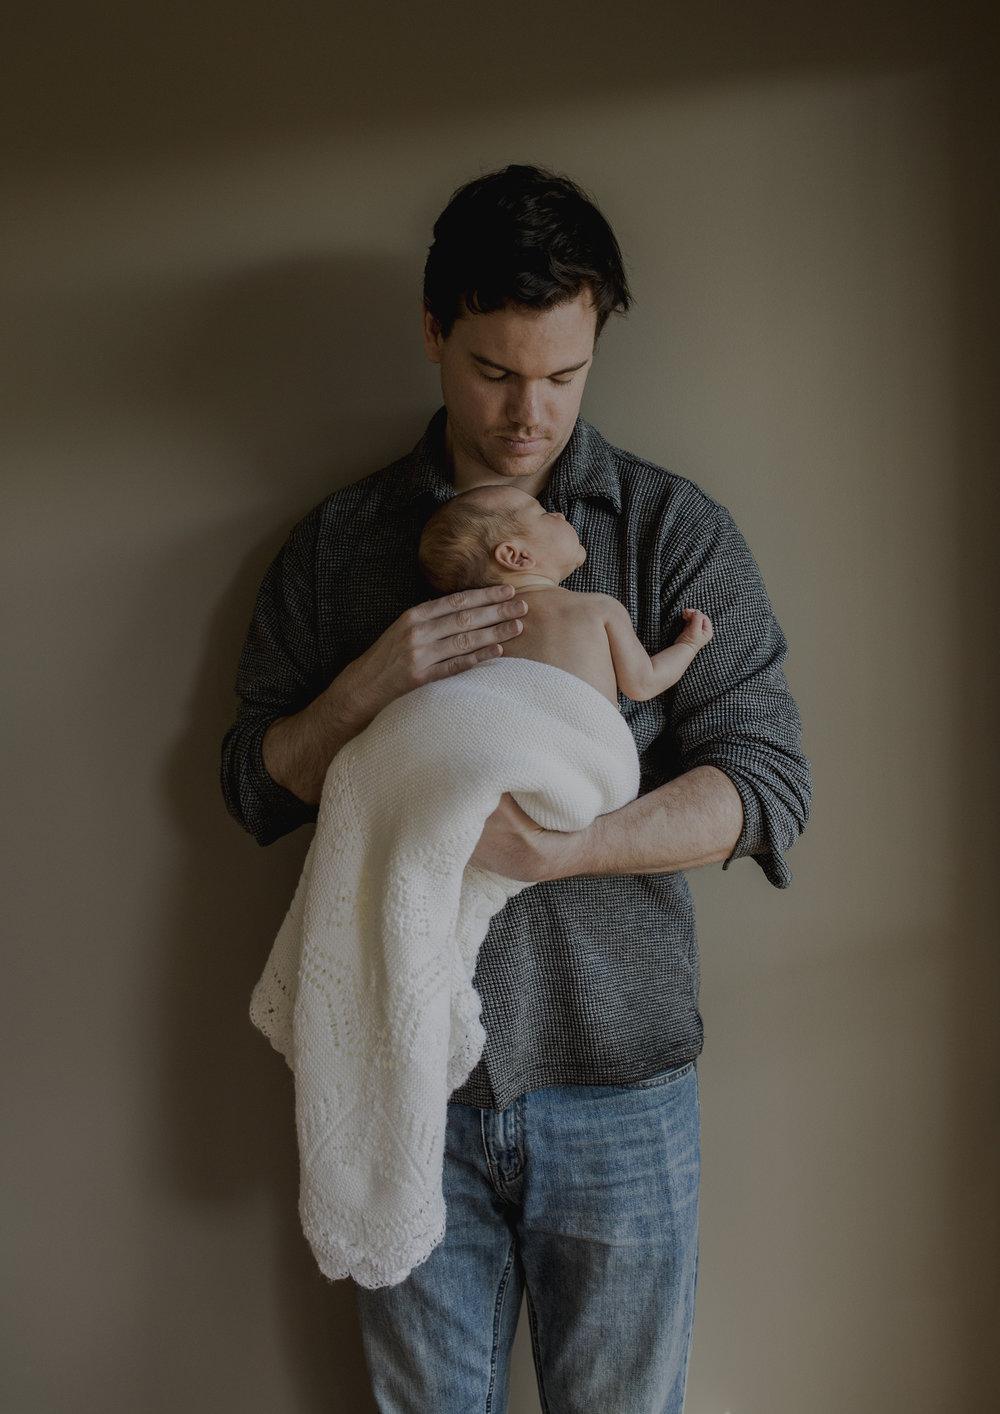 New Dad cuddling his newborn baby girl to sleep